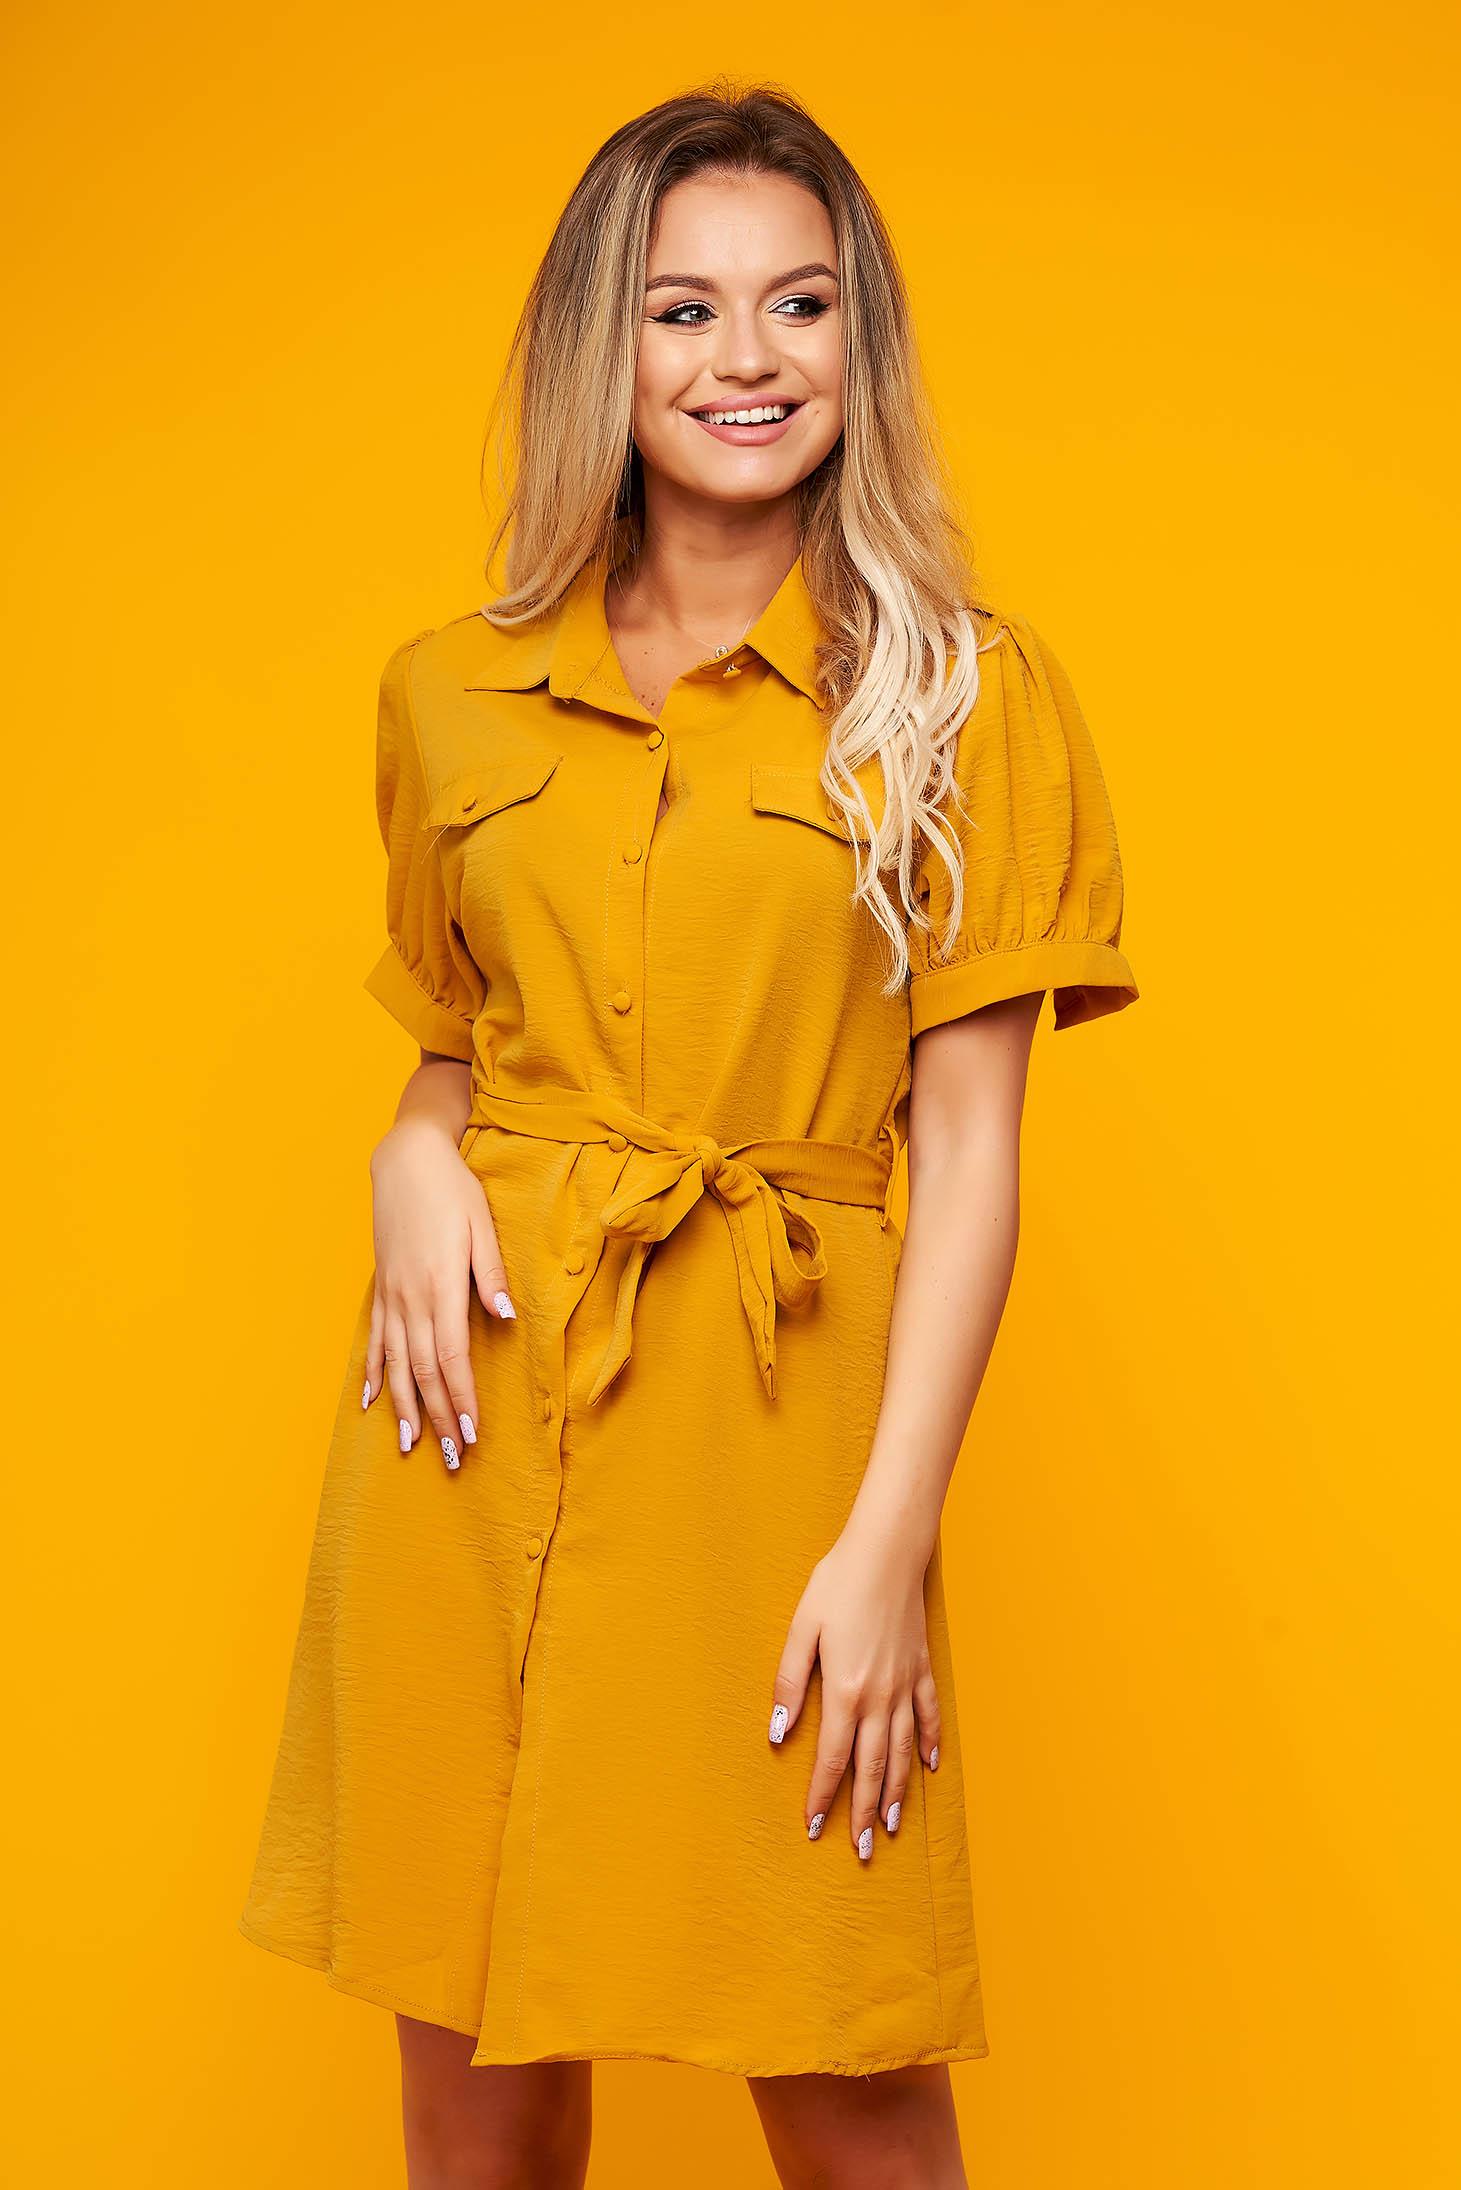 Mustard dress daily short cut flared short sleeves thin fabric